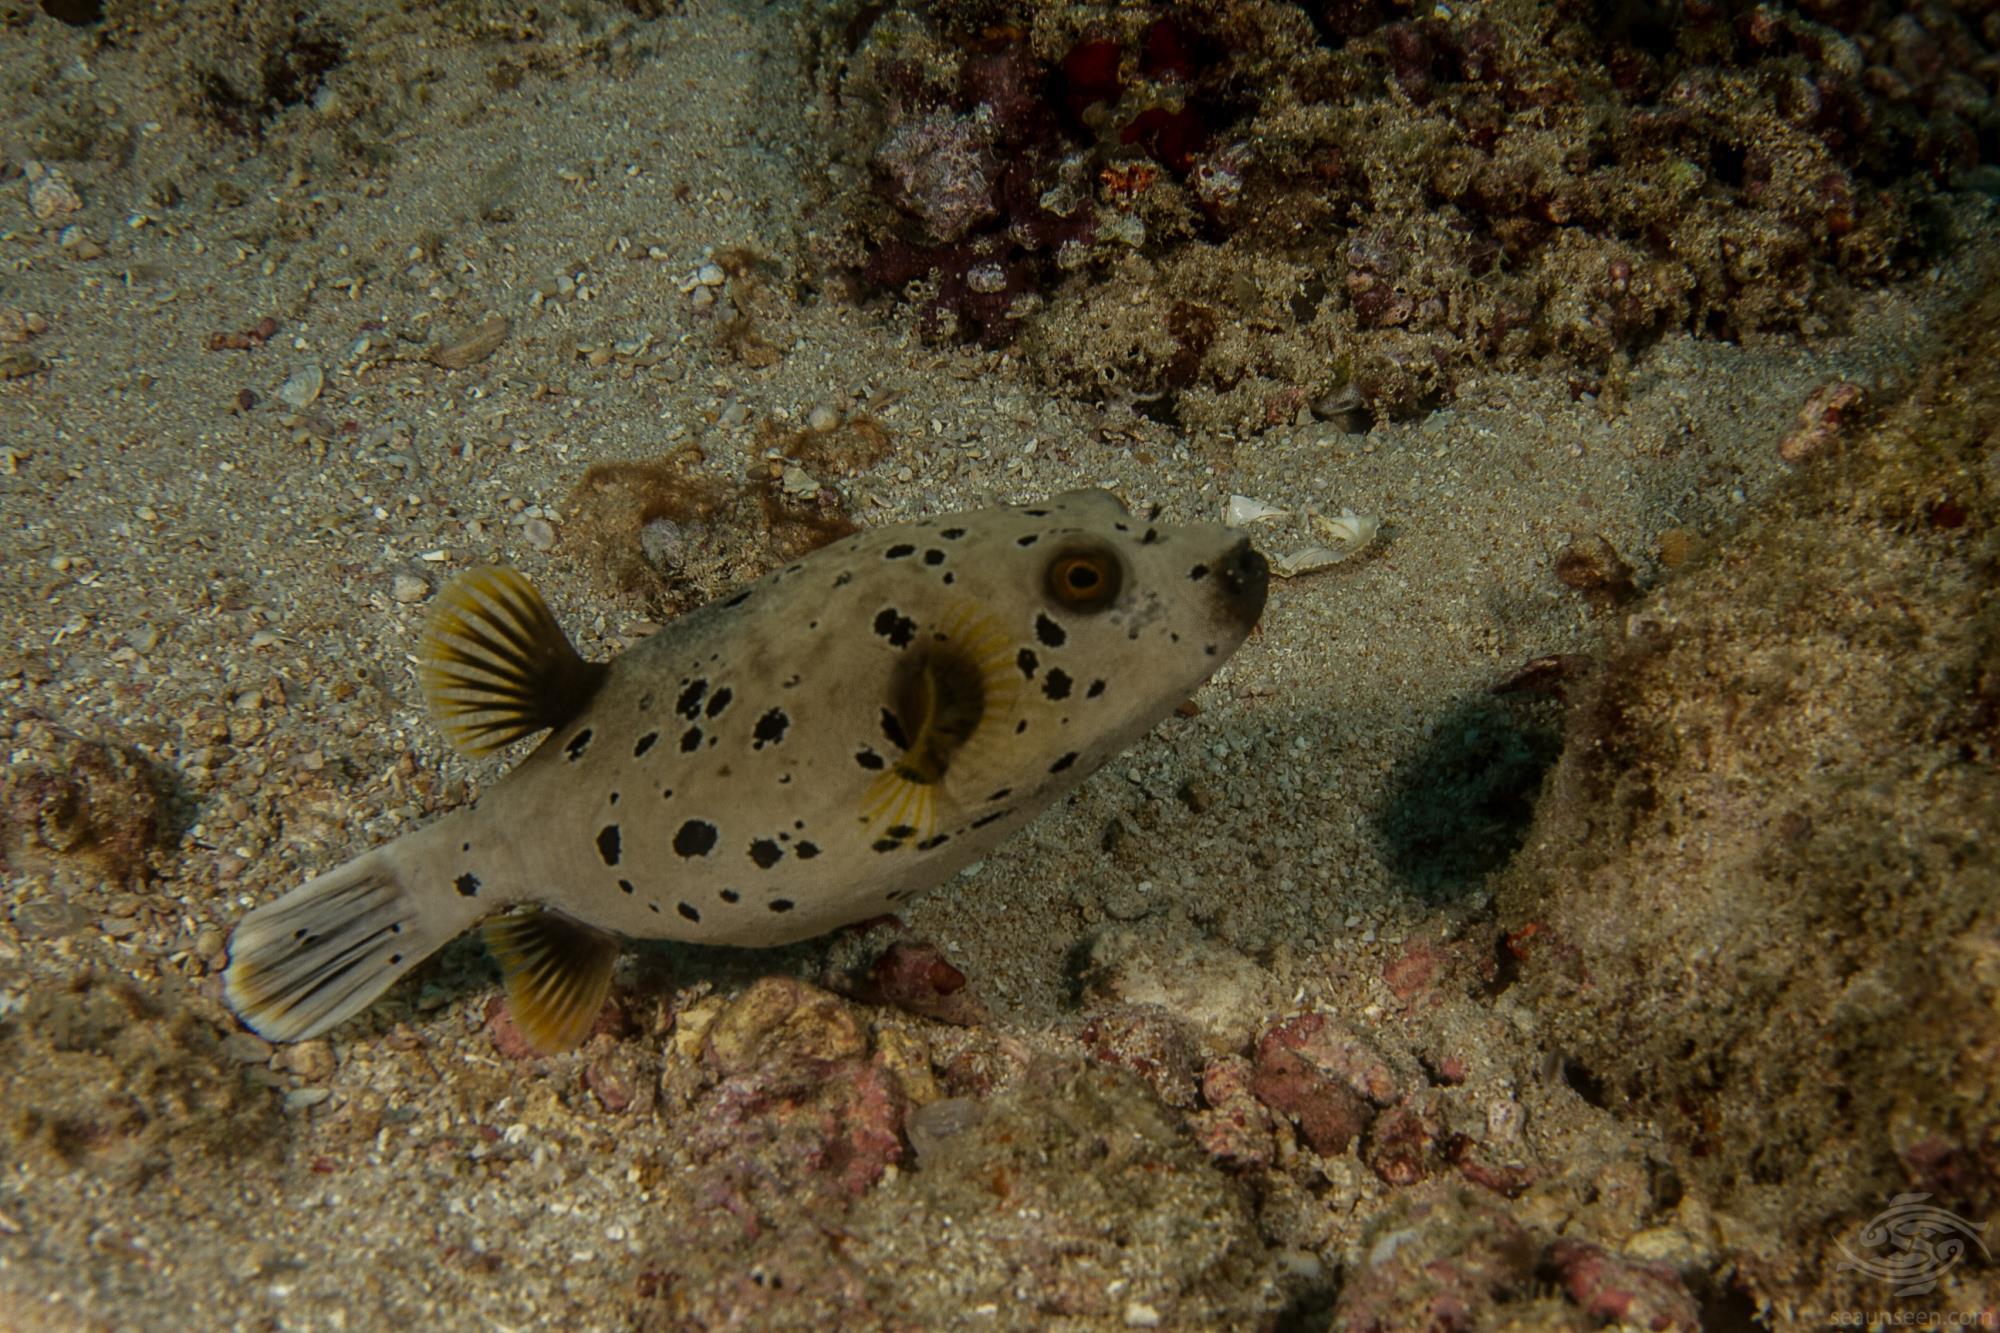 black spotted pufferfish or blowfish, Arothron nigropunctatus